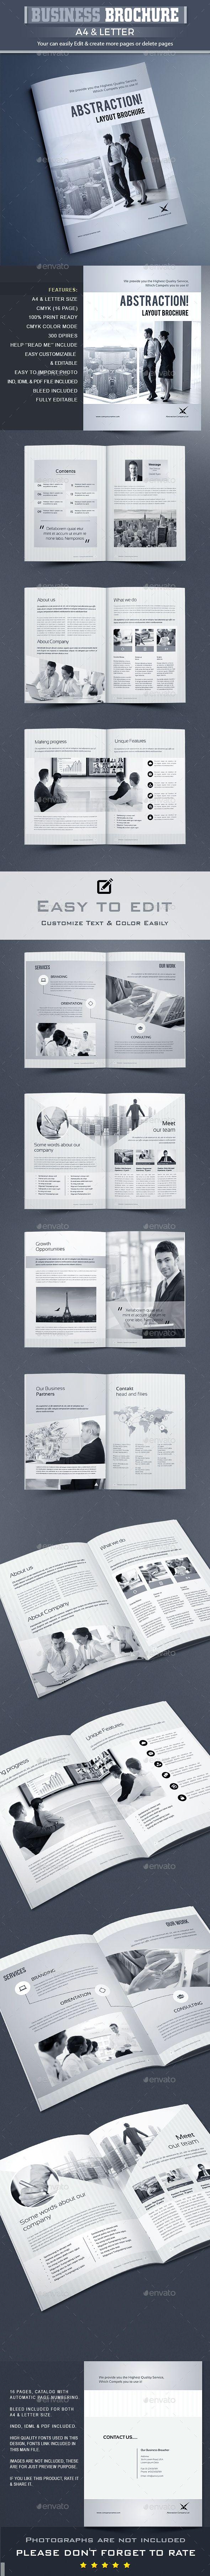 Abstrakt - Corporate Brochure Template InDesign INDD - 16 Unique Pages, A4 & US Letter Size #design